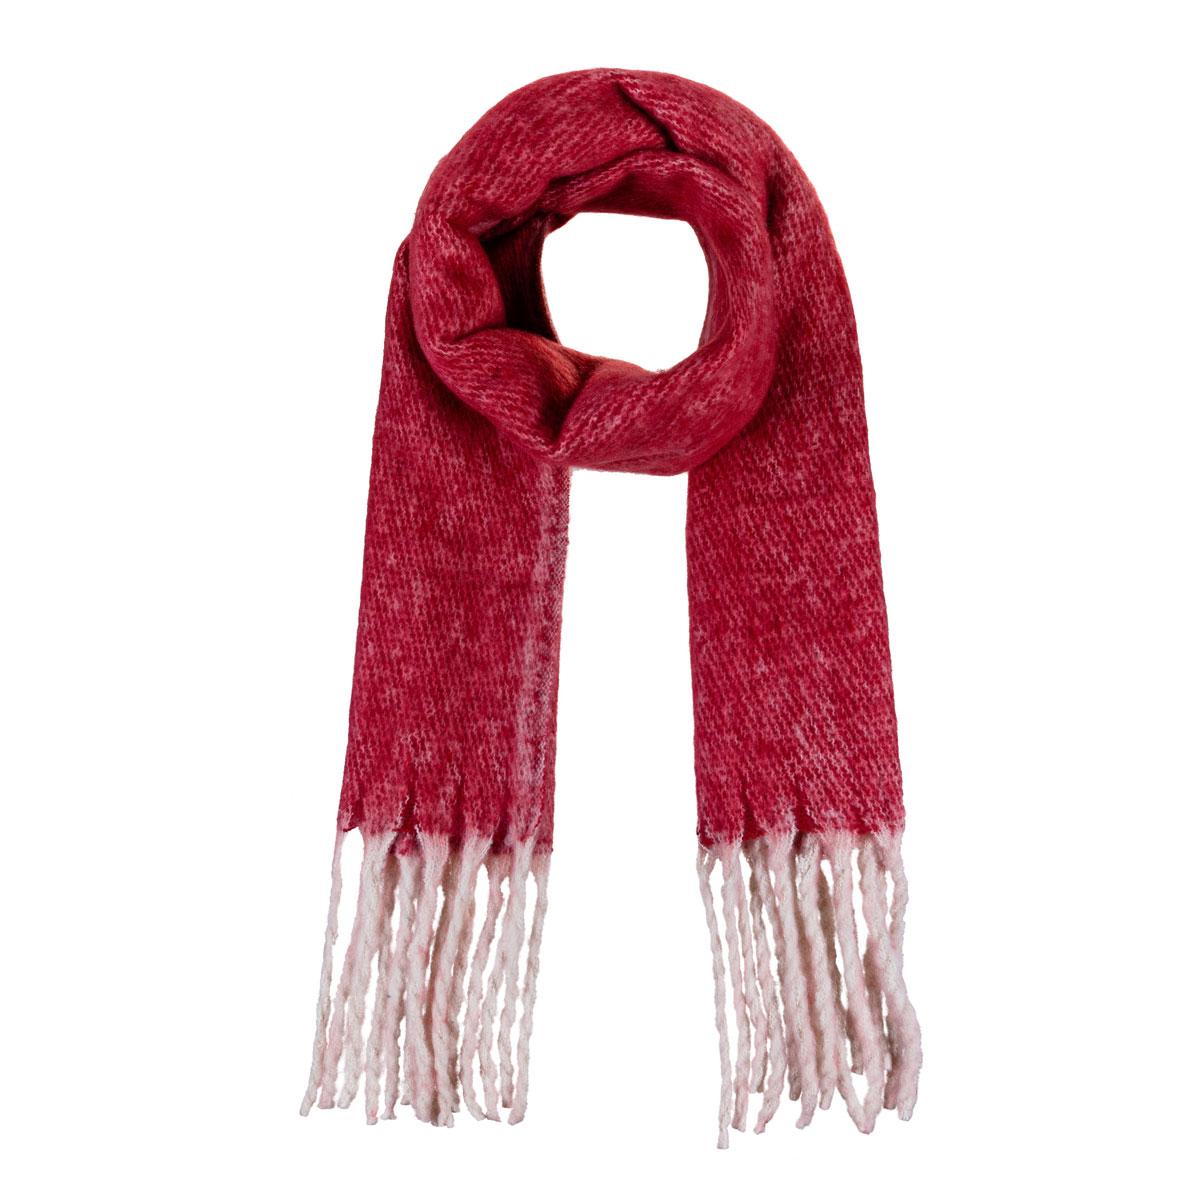 AT-06302-F12-echarpe-femme-chaude-rouge